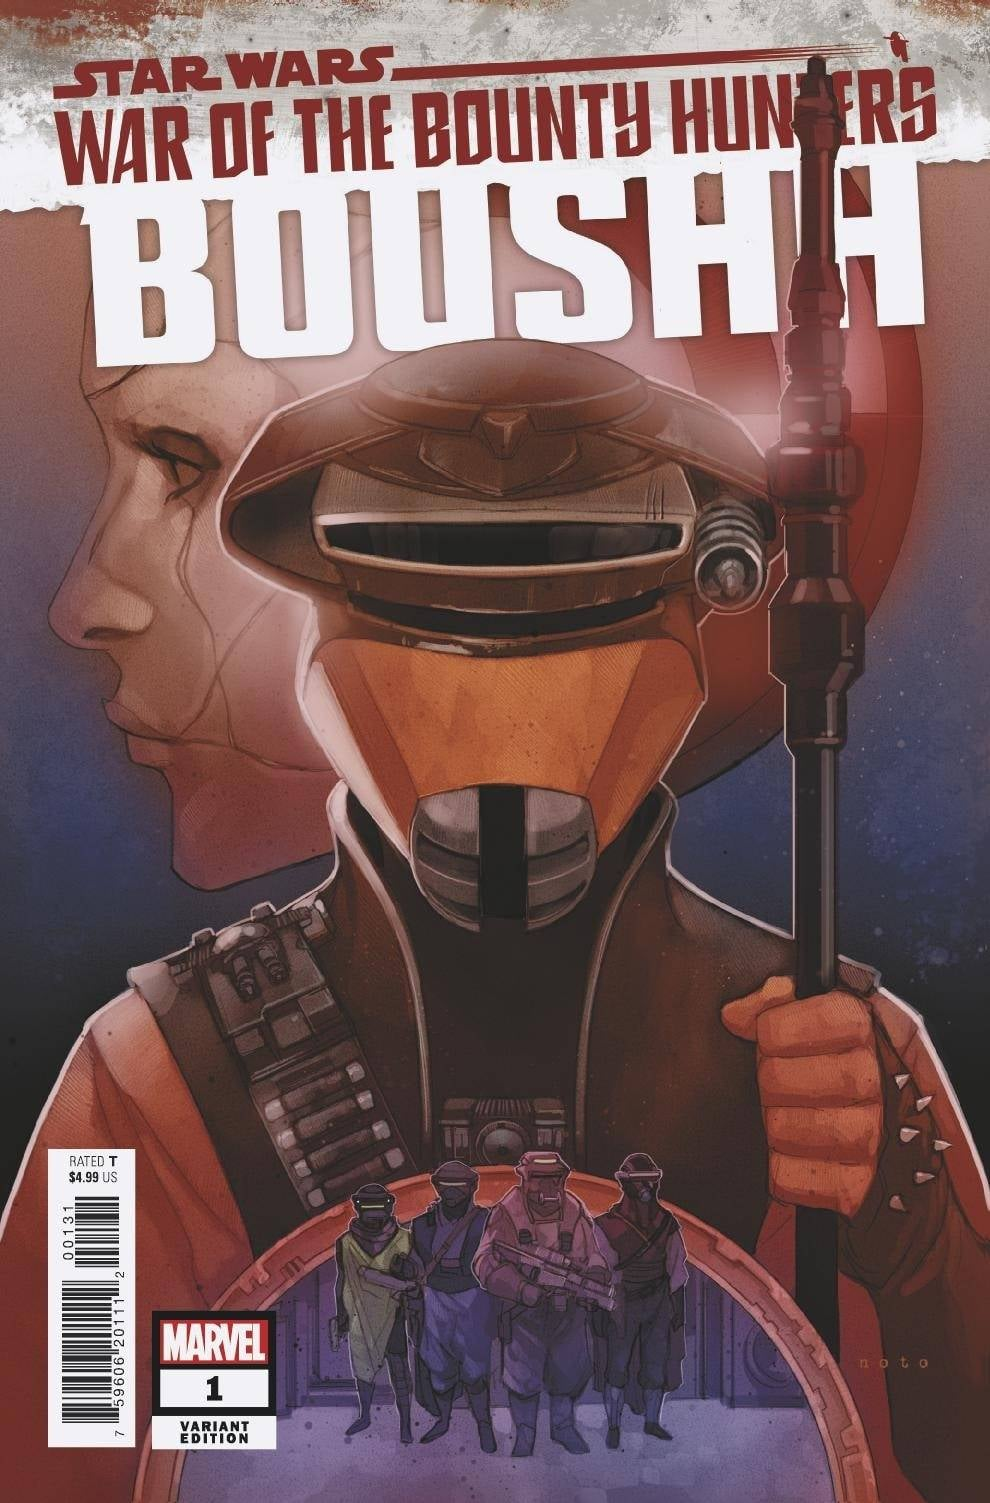 Star Wars War of the Bounty Hunters: Boushh - Noto Variant